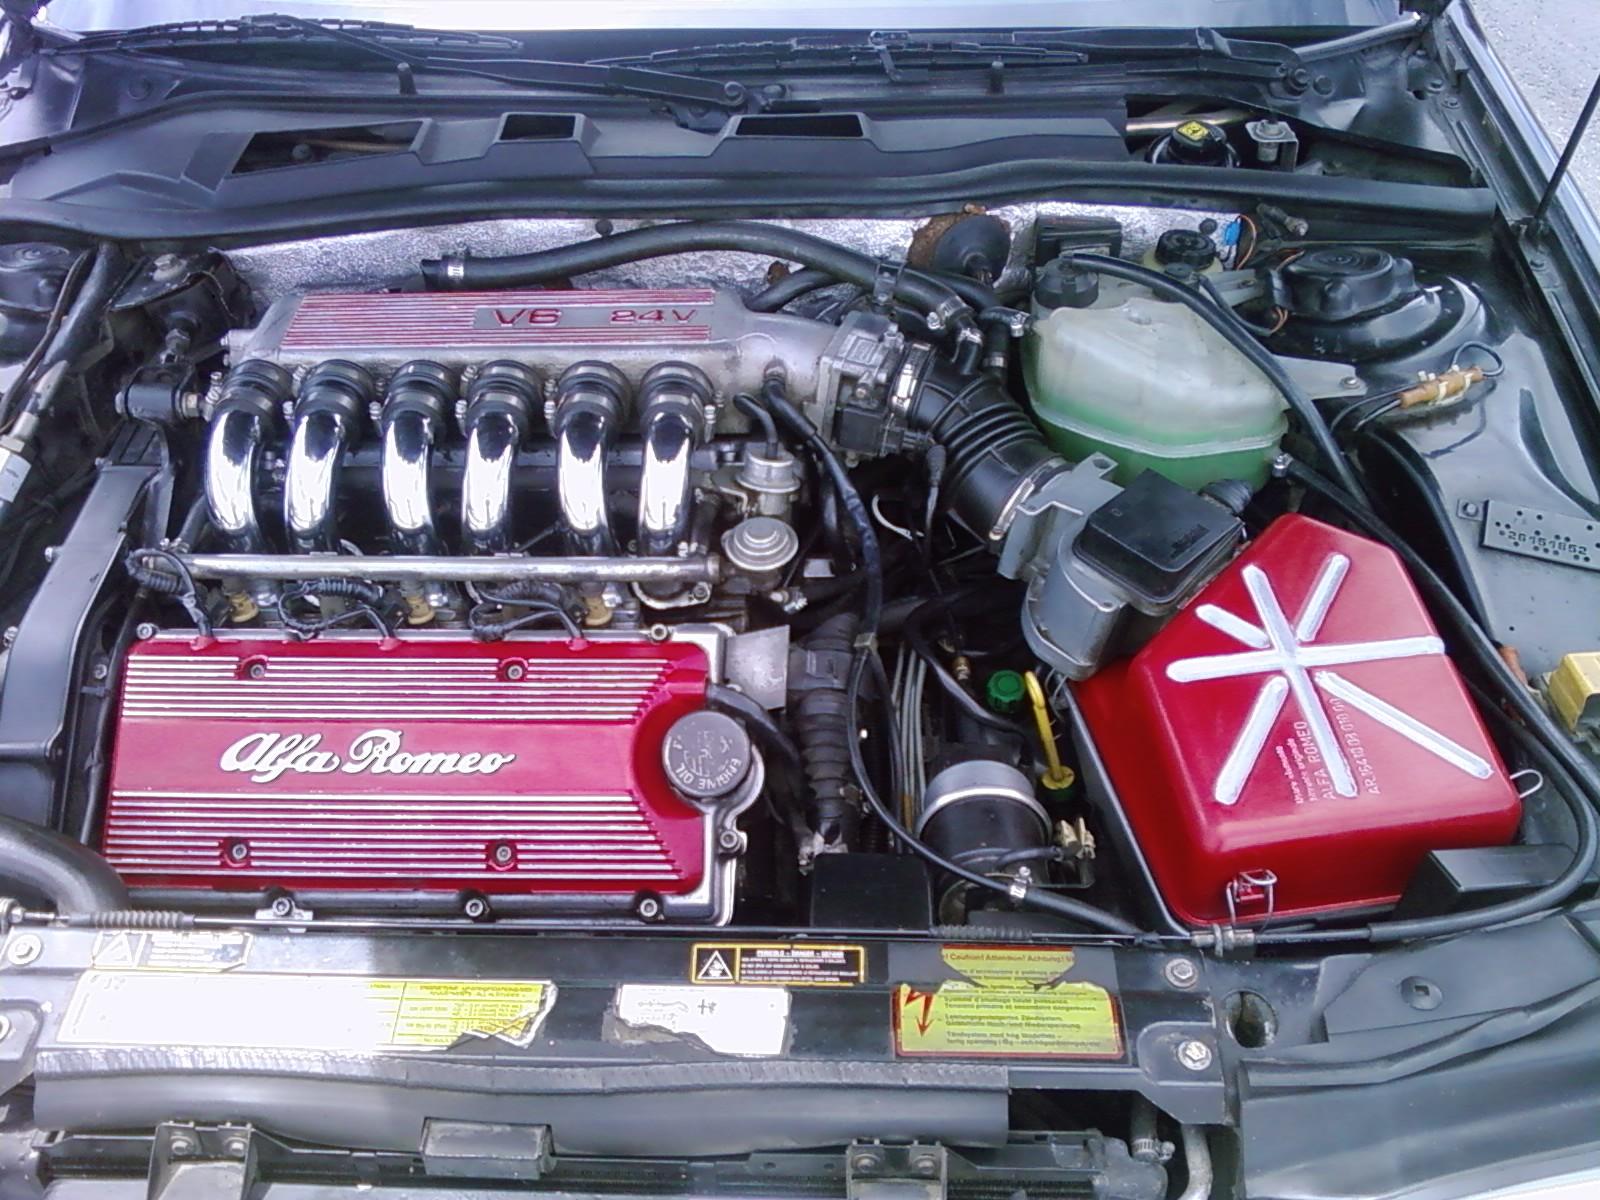 Alfa romeo gtv for sale craigslist 12